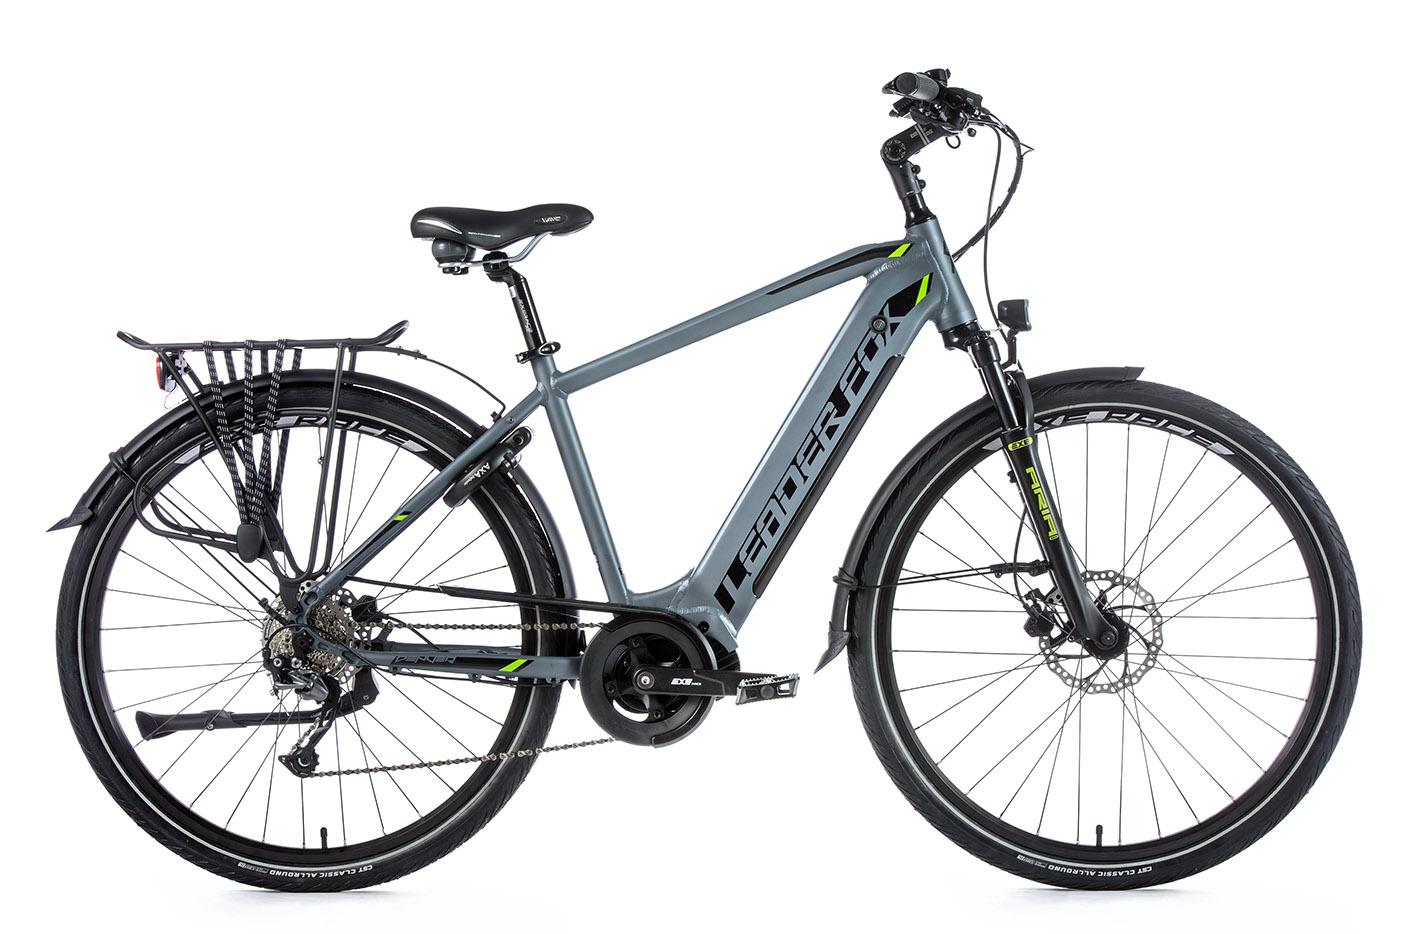 Bicicleta electrica Trekking Leader Fox Denver Gent, 2020